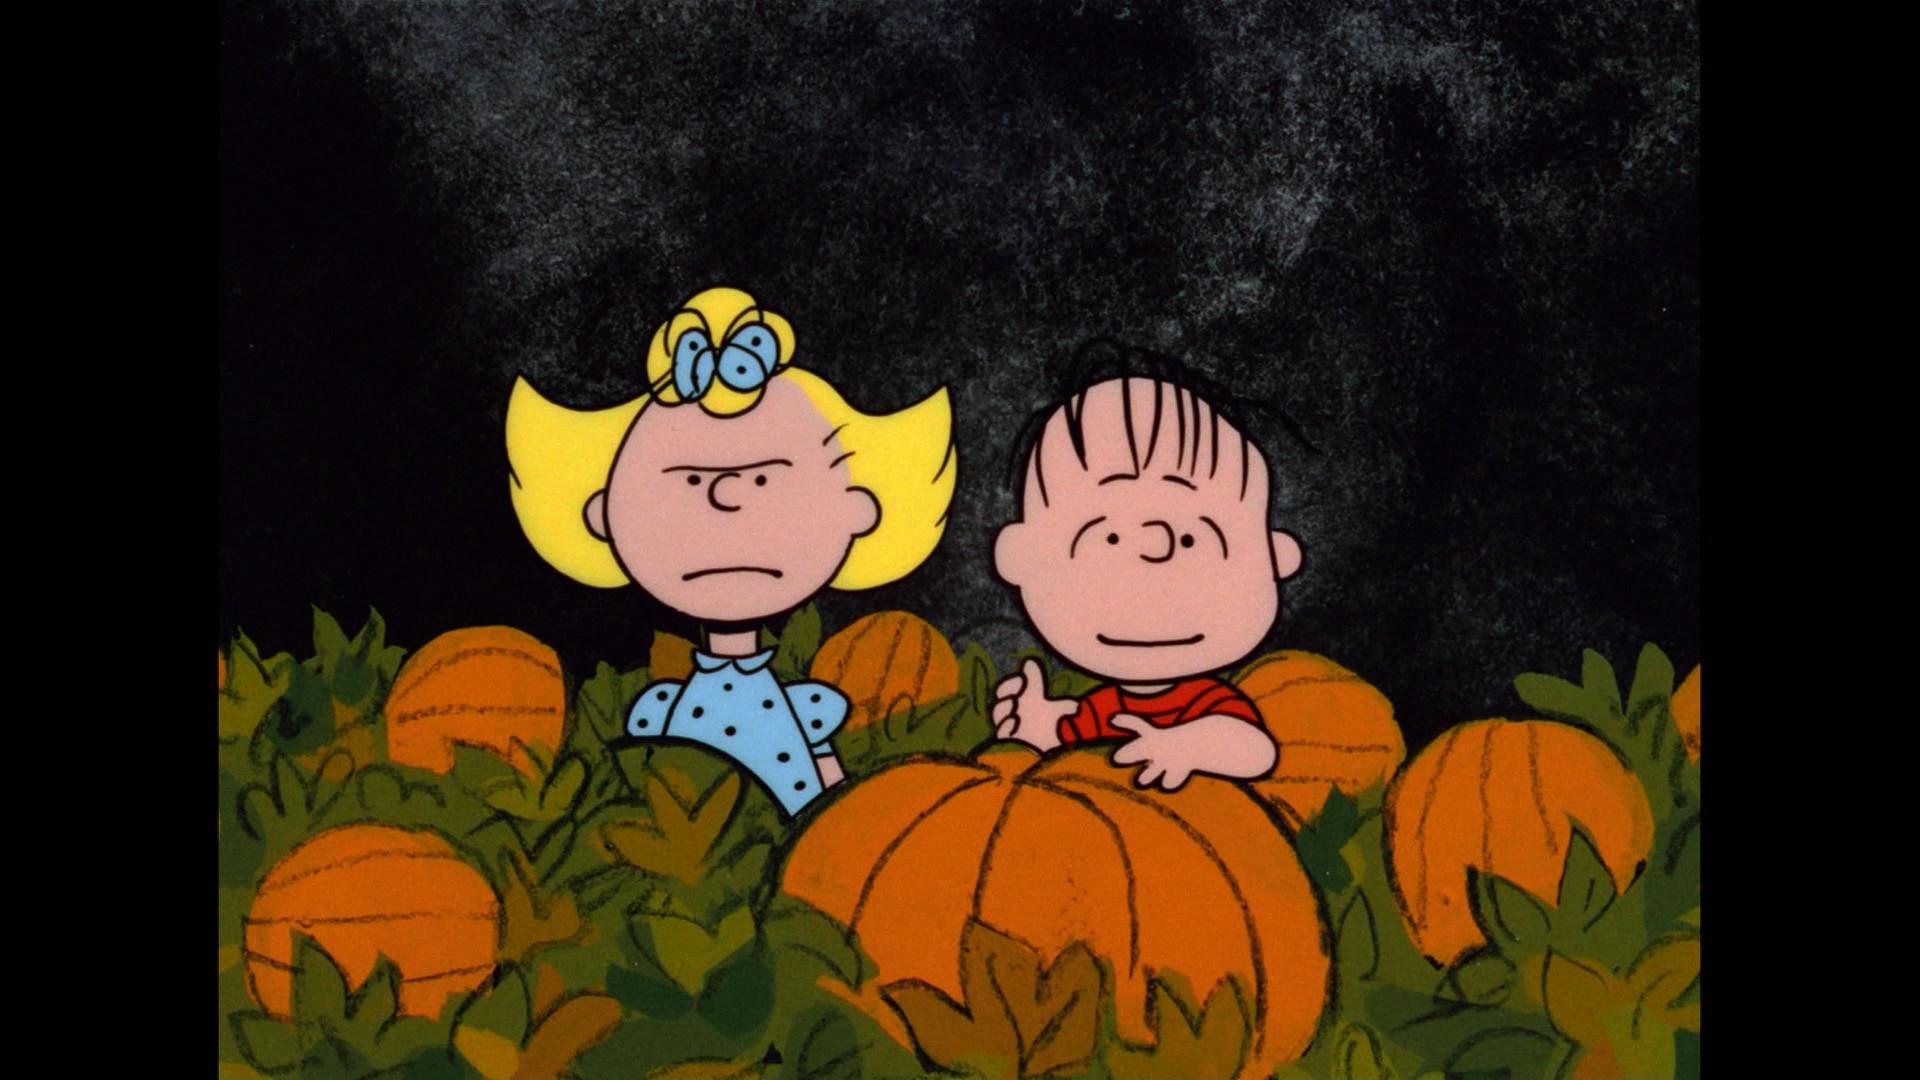 Great Pumpkin Charlie Brown Wallpaper 183 ① Wallpapertag